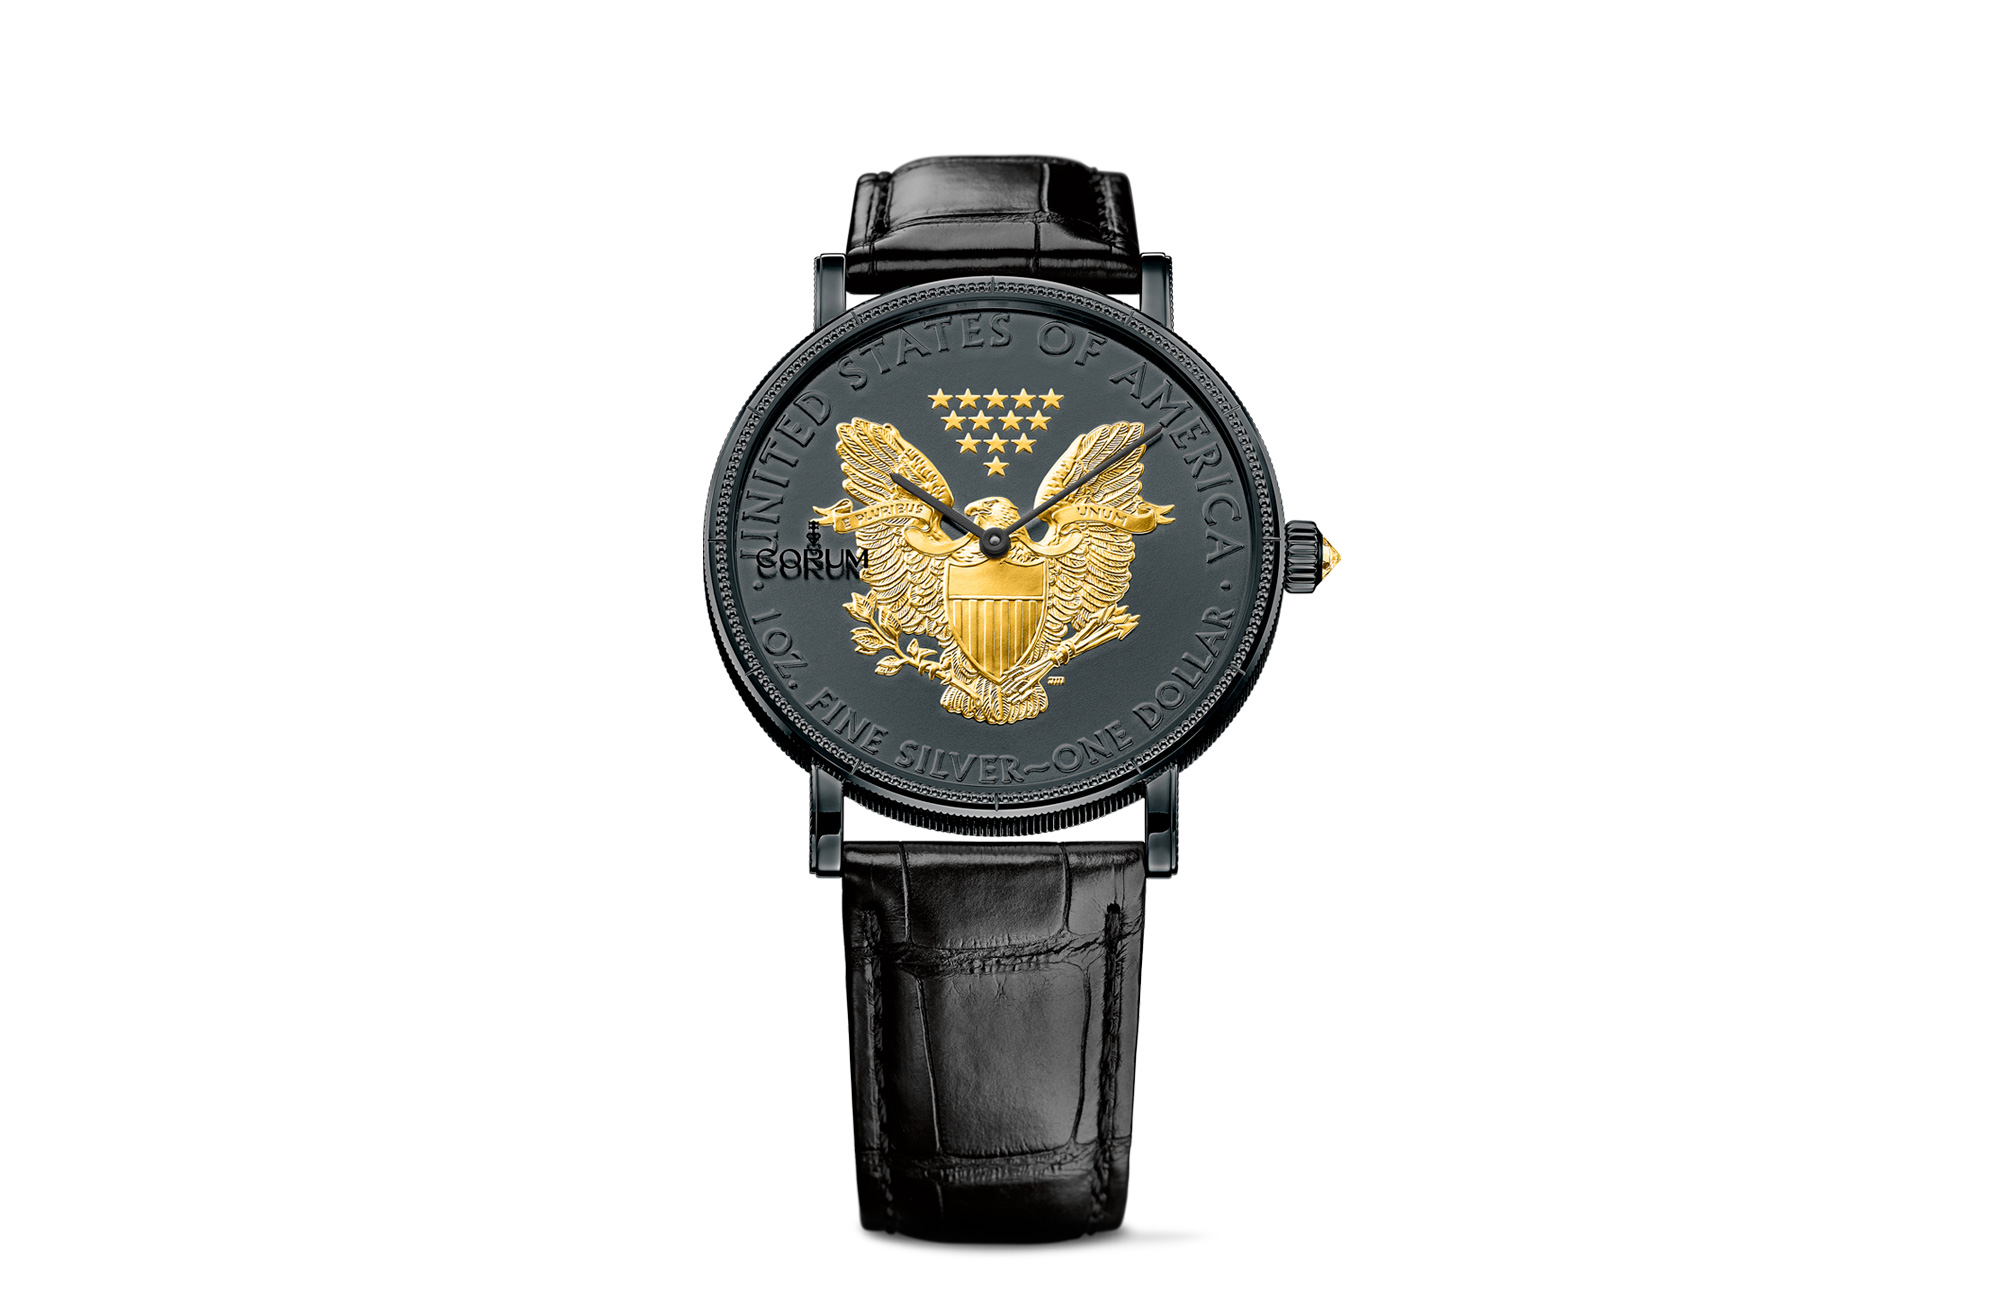 Corum Heritage Coin watch